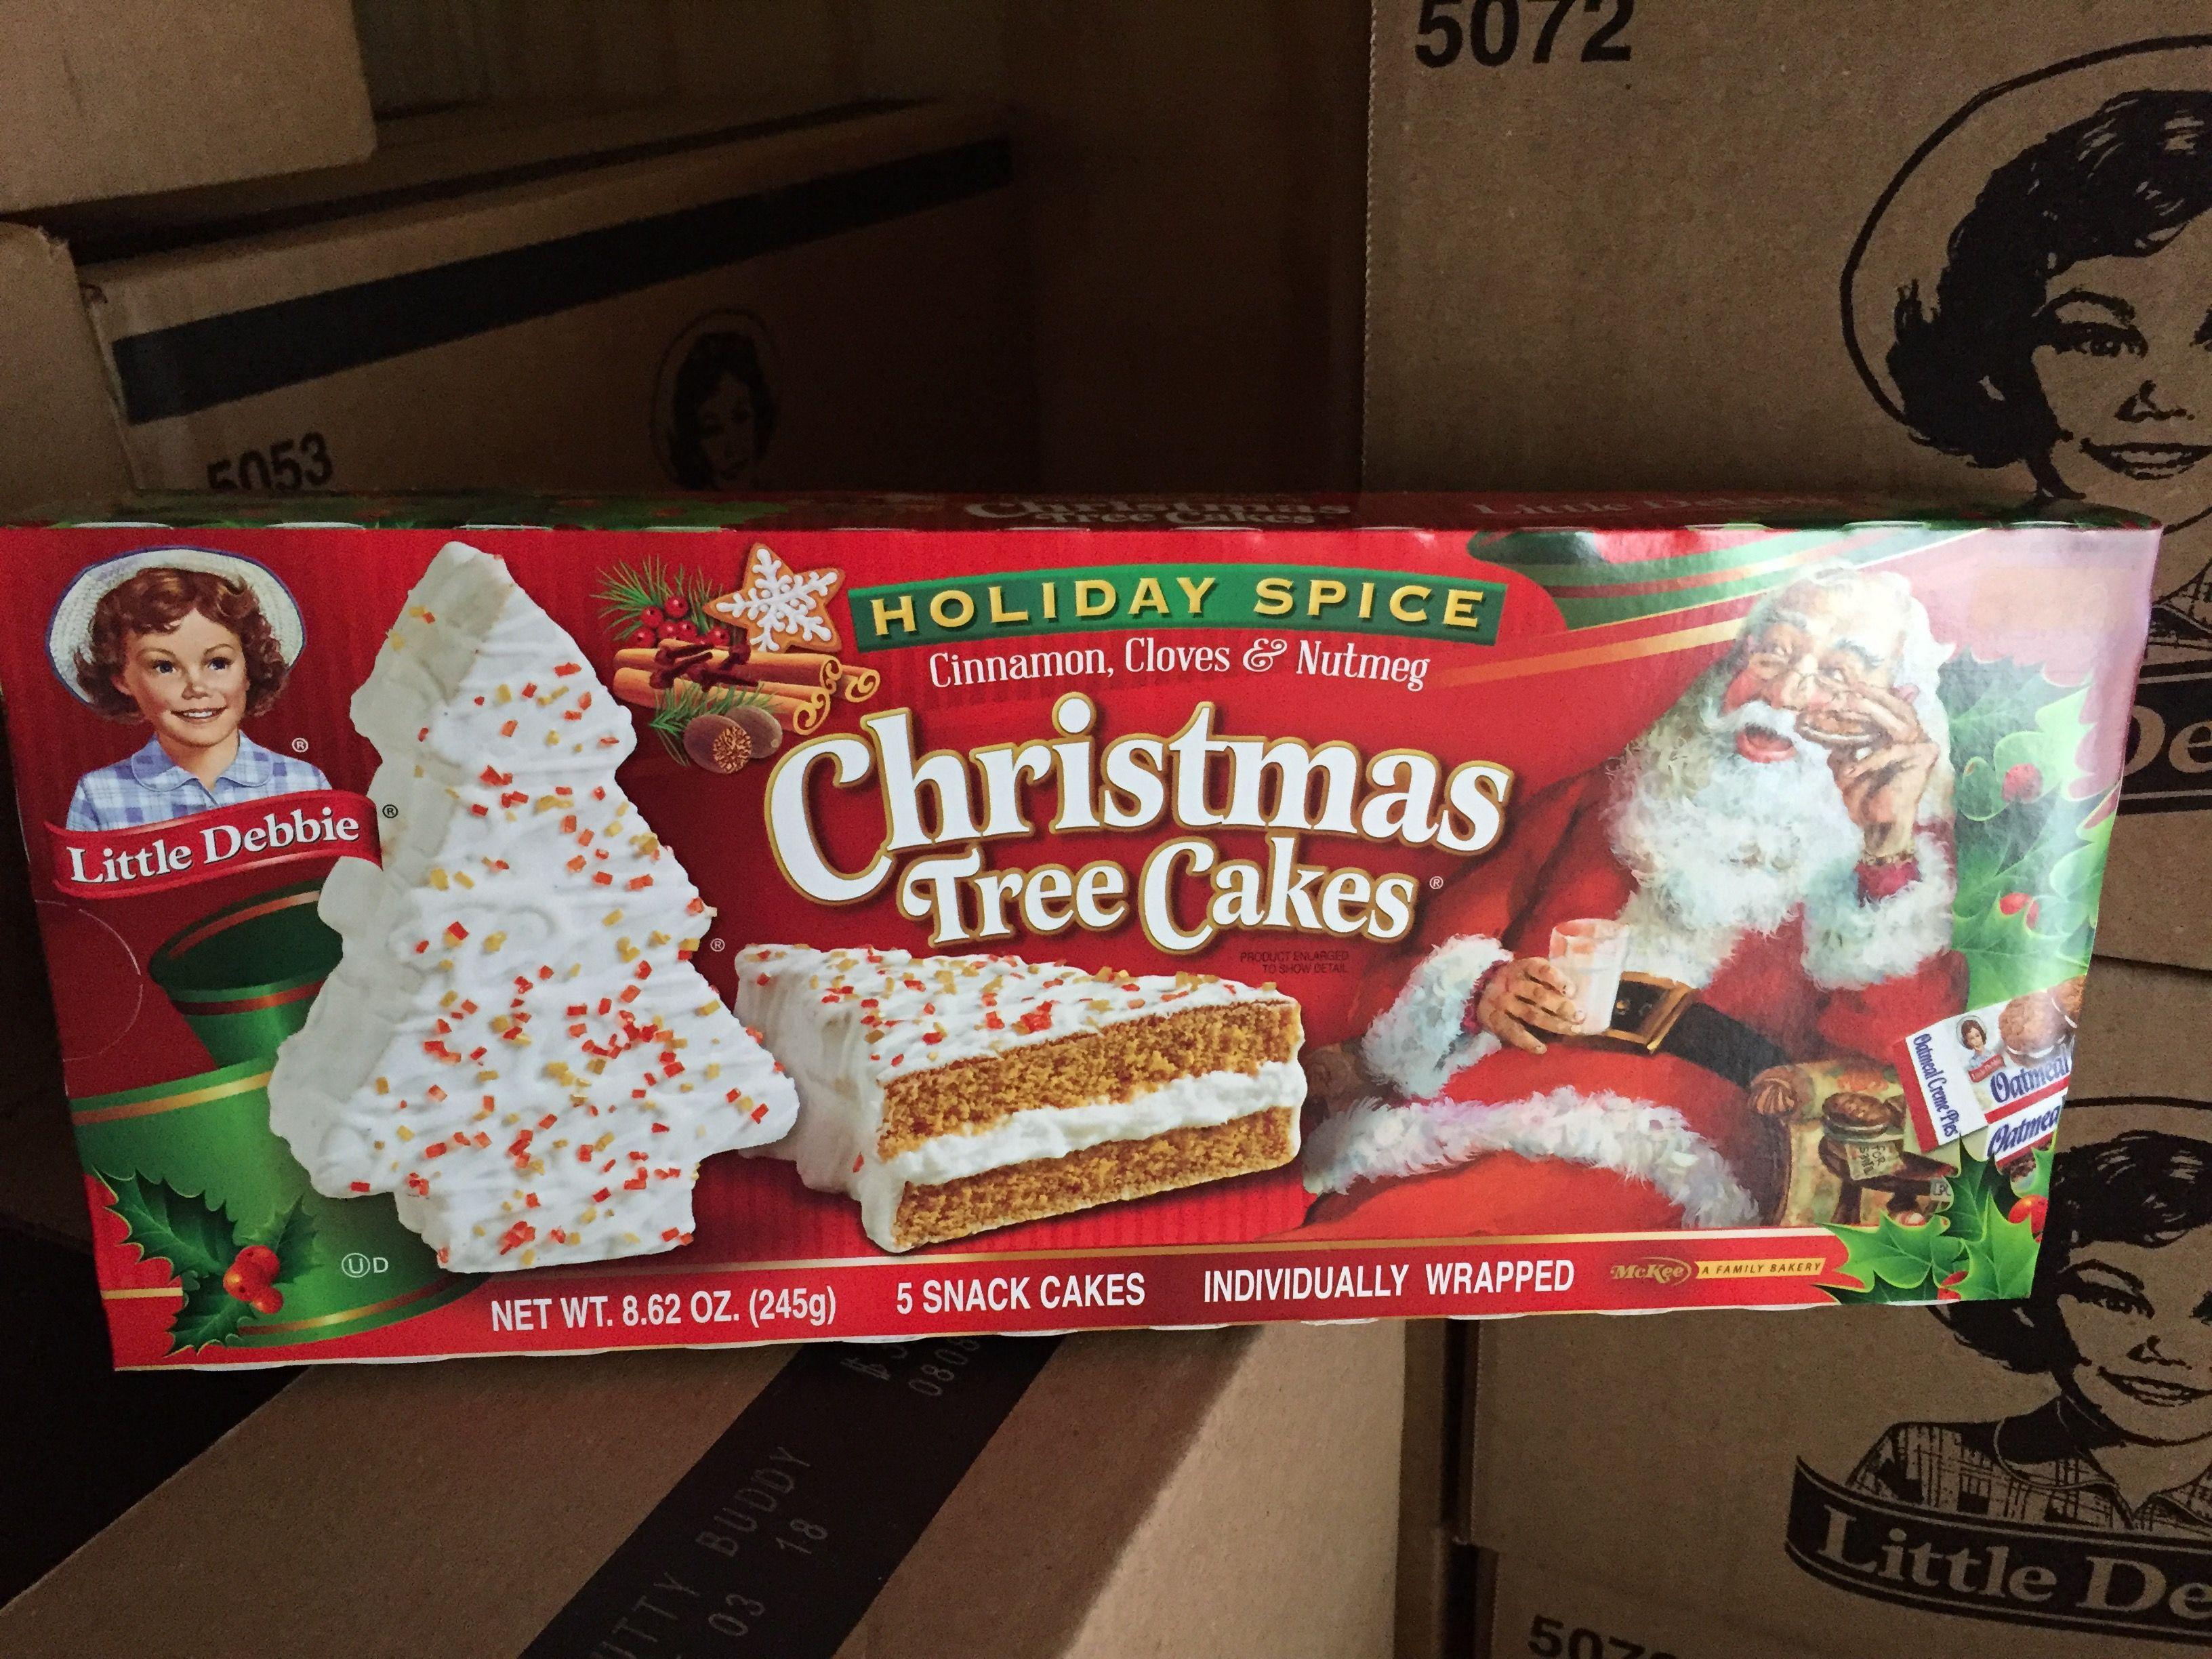 Little Debbie Holiday Spice Christmas Tree Cake